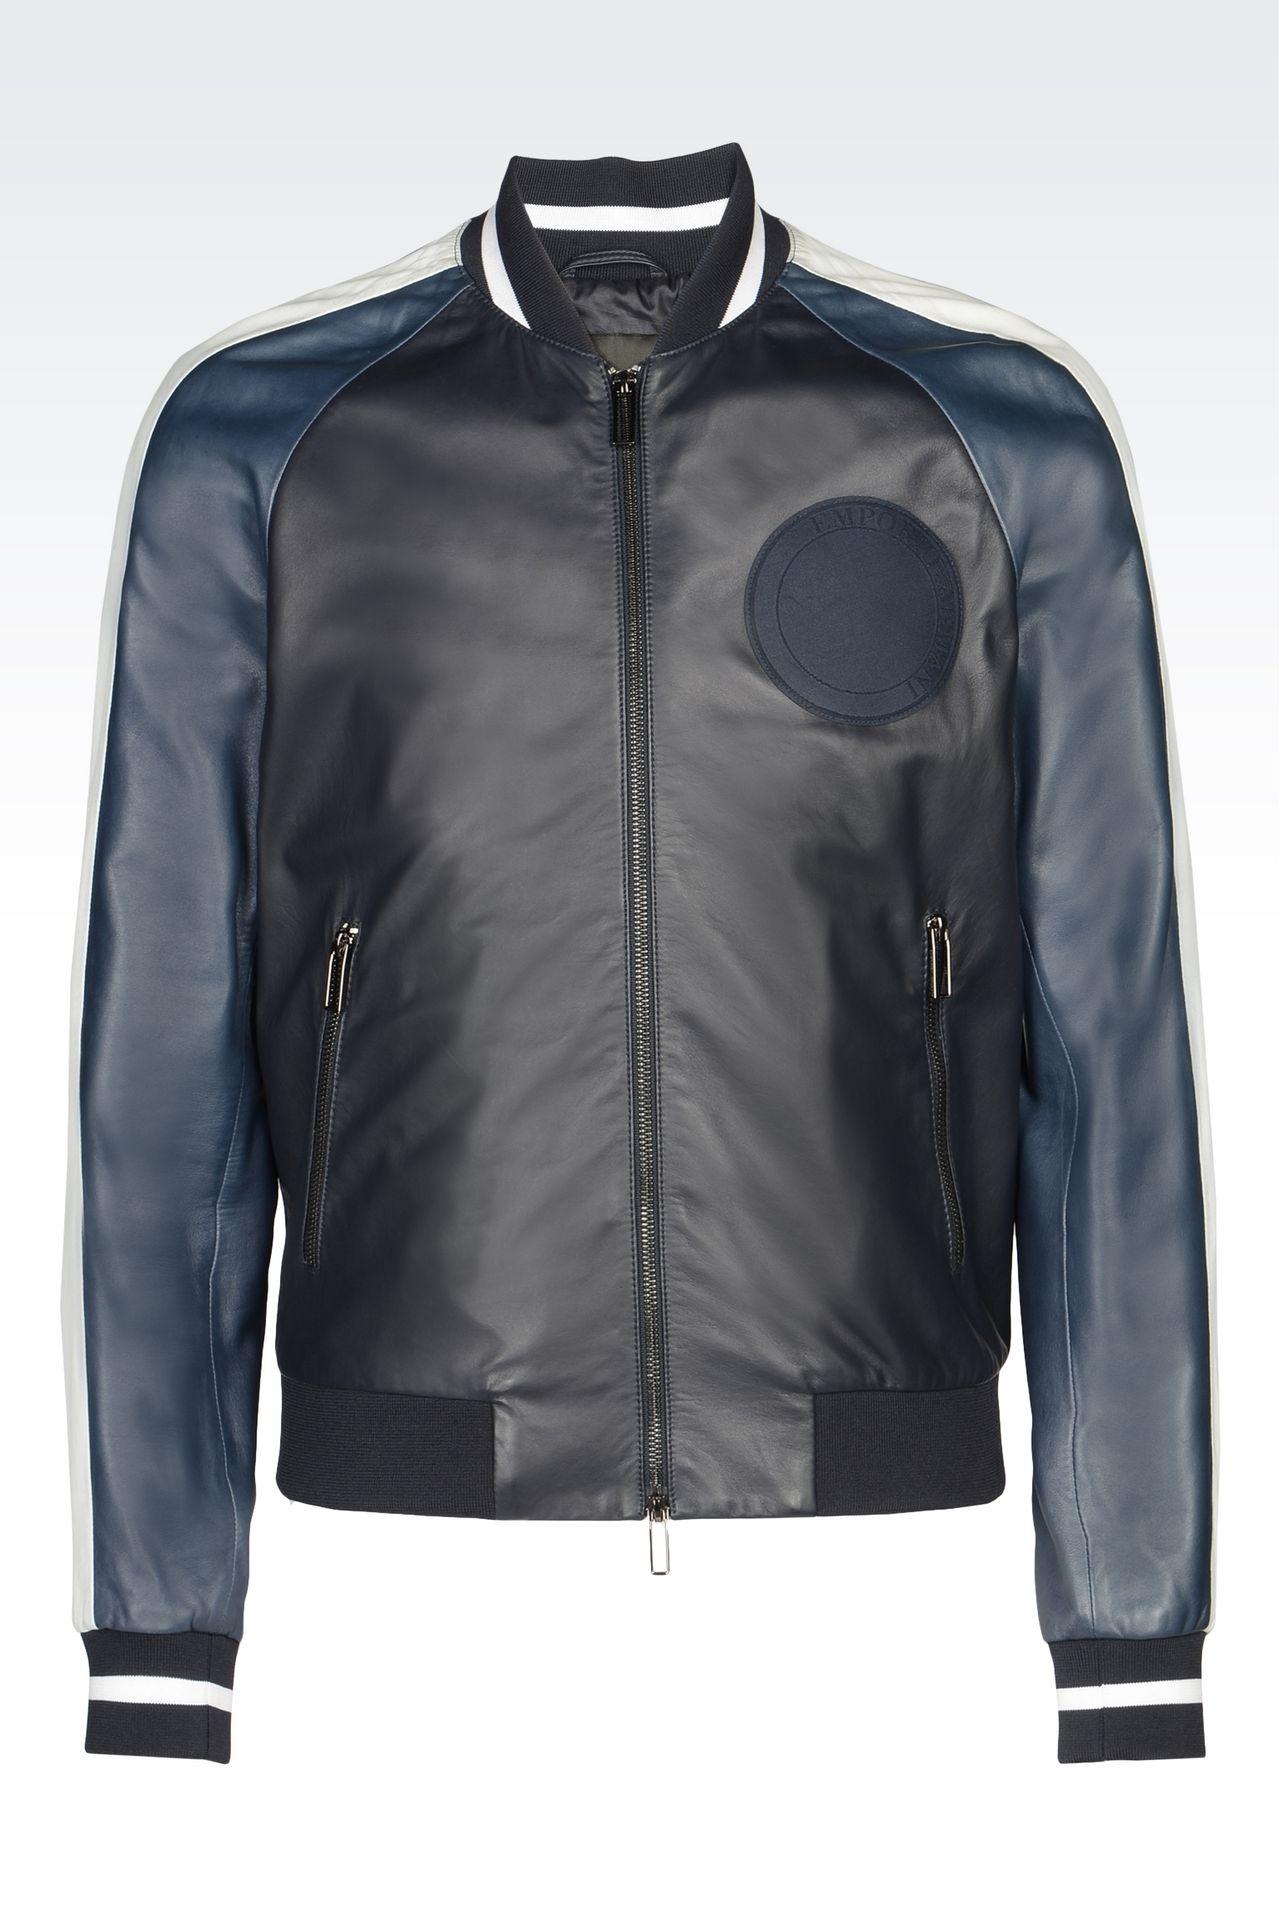 armani jackets leatherwear: light leather jackets men by armani - 0 UWKLTZX